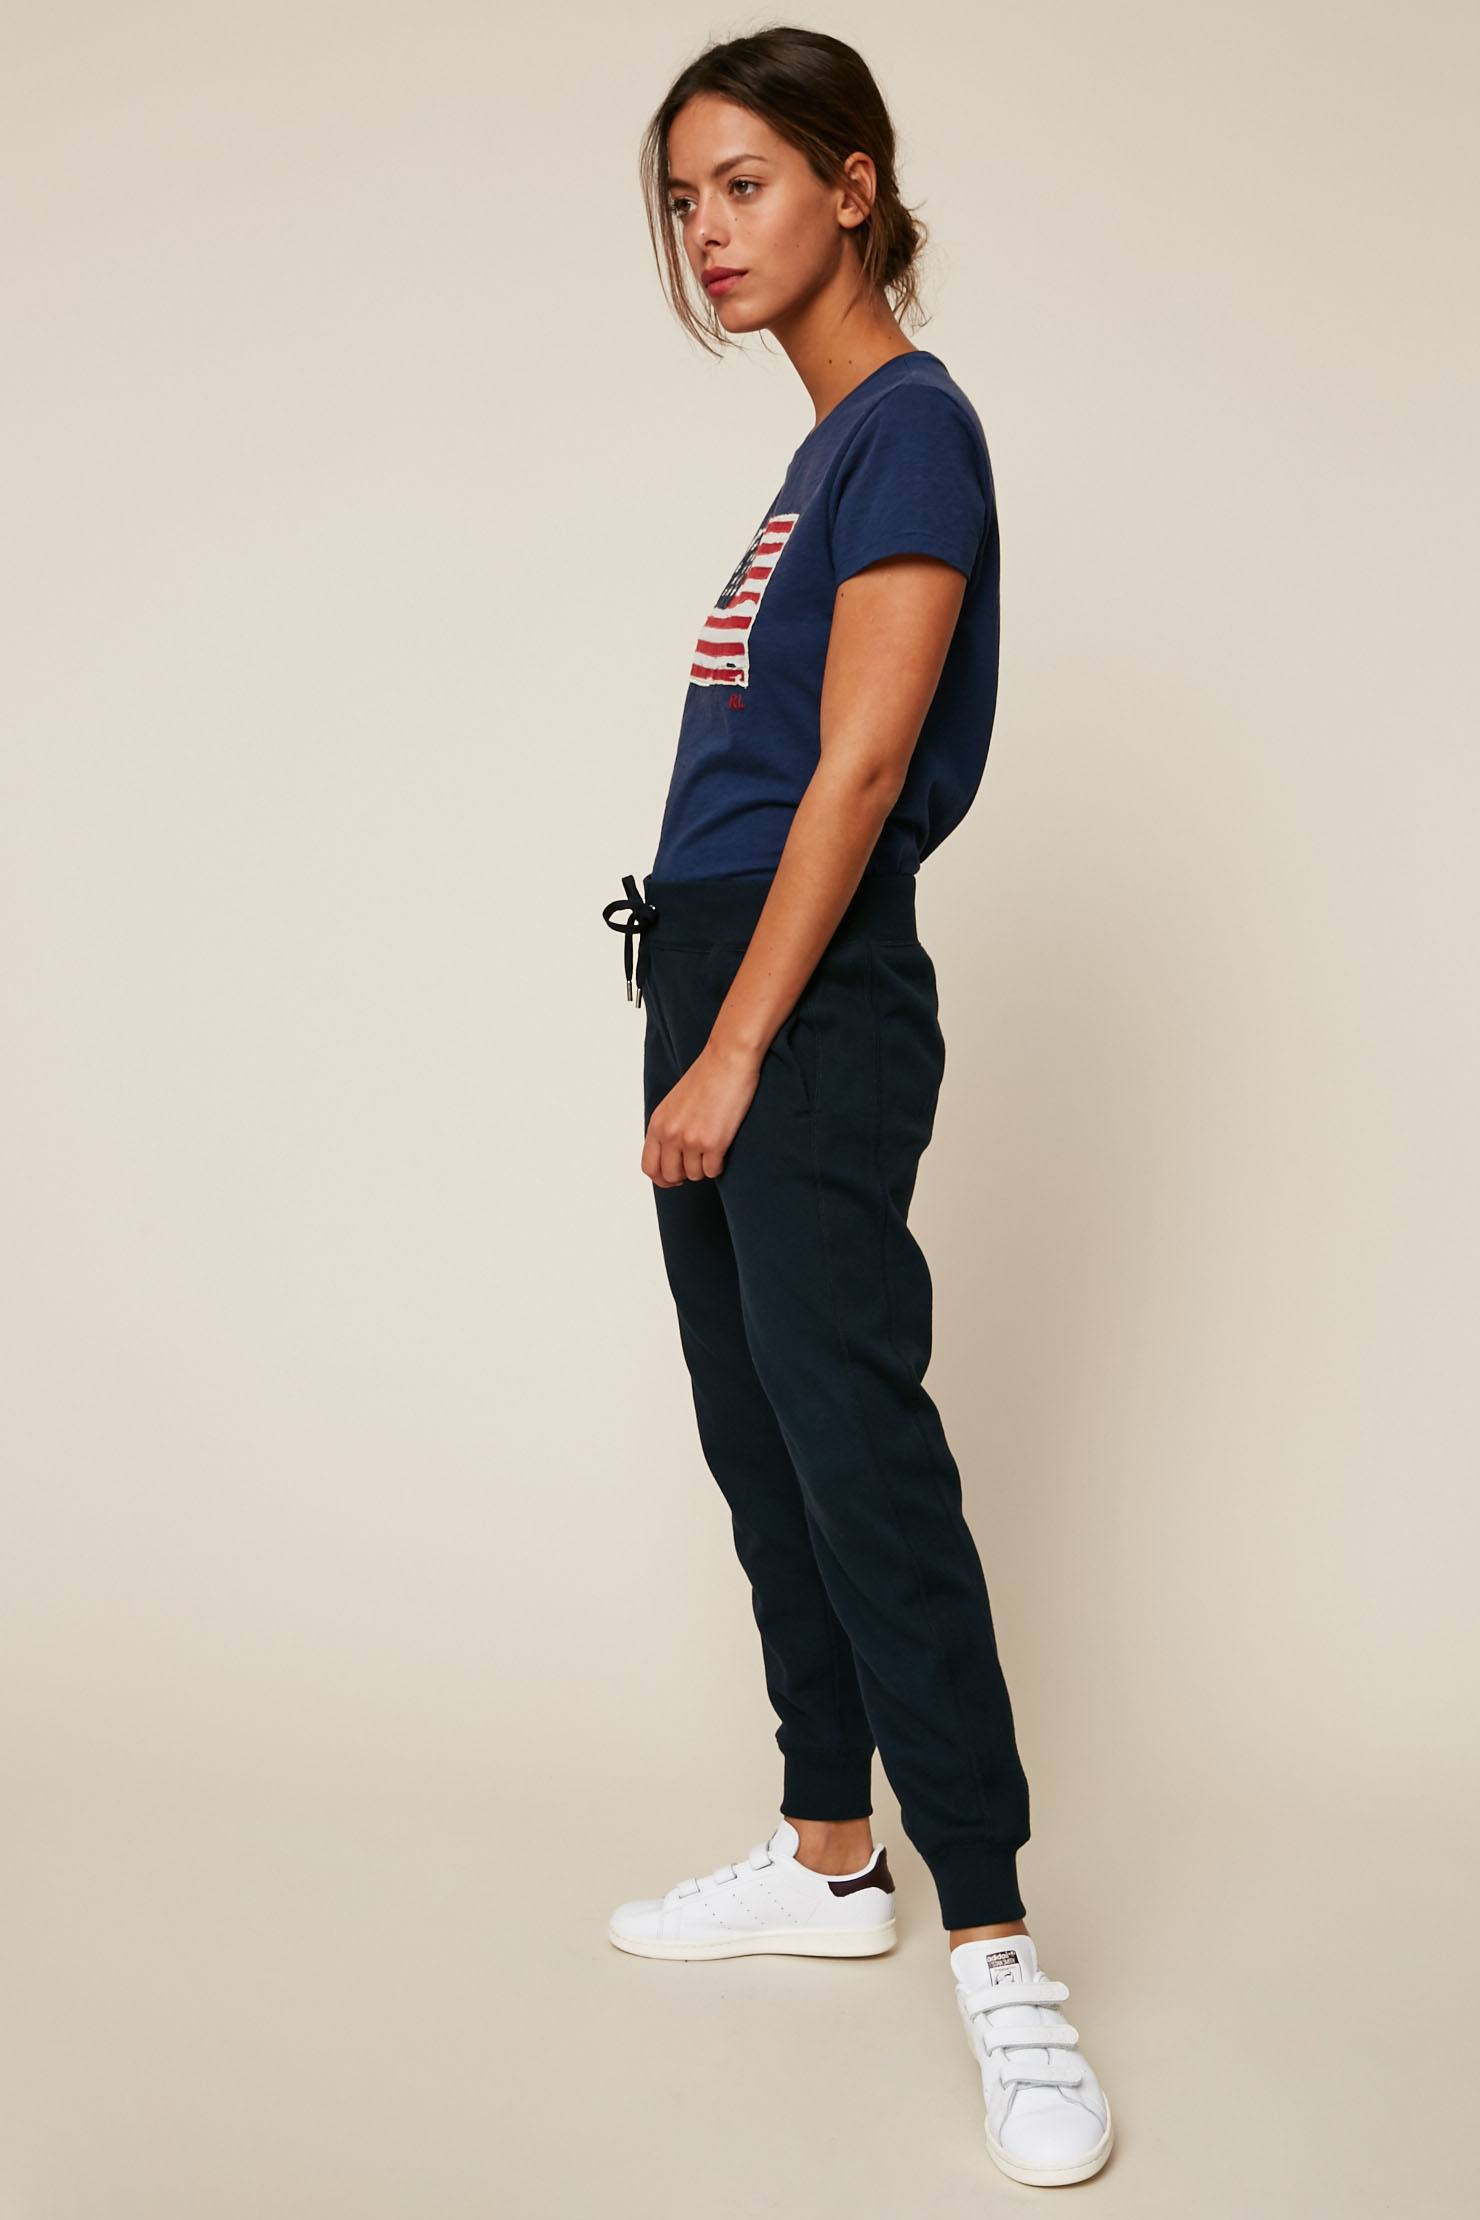 Ralph Pantalon Lauren De Polo Jogging Marine Femme Y76gbfyv